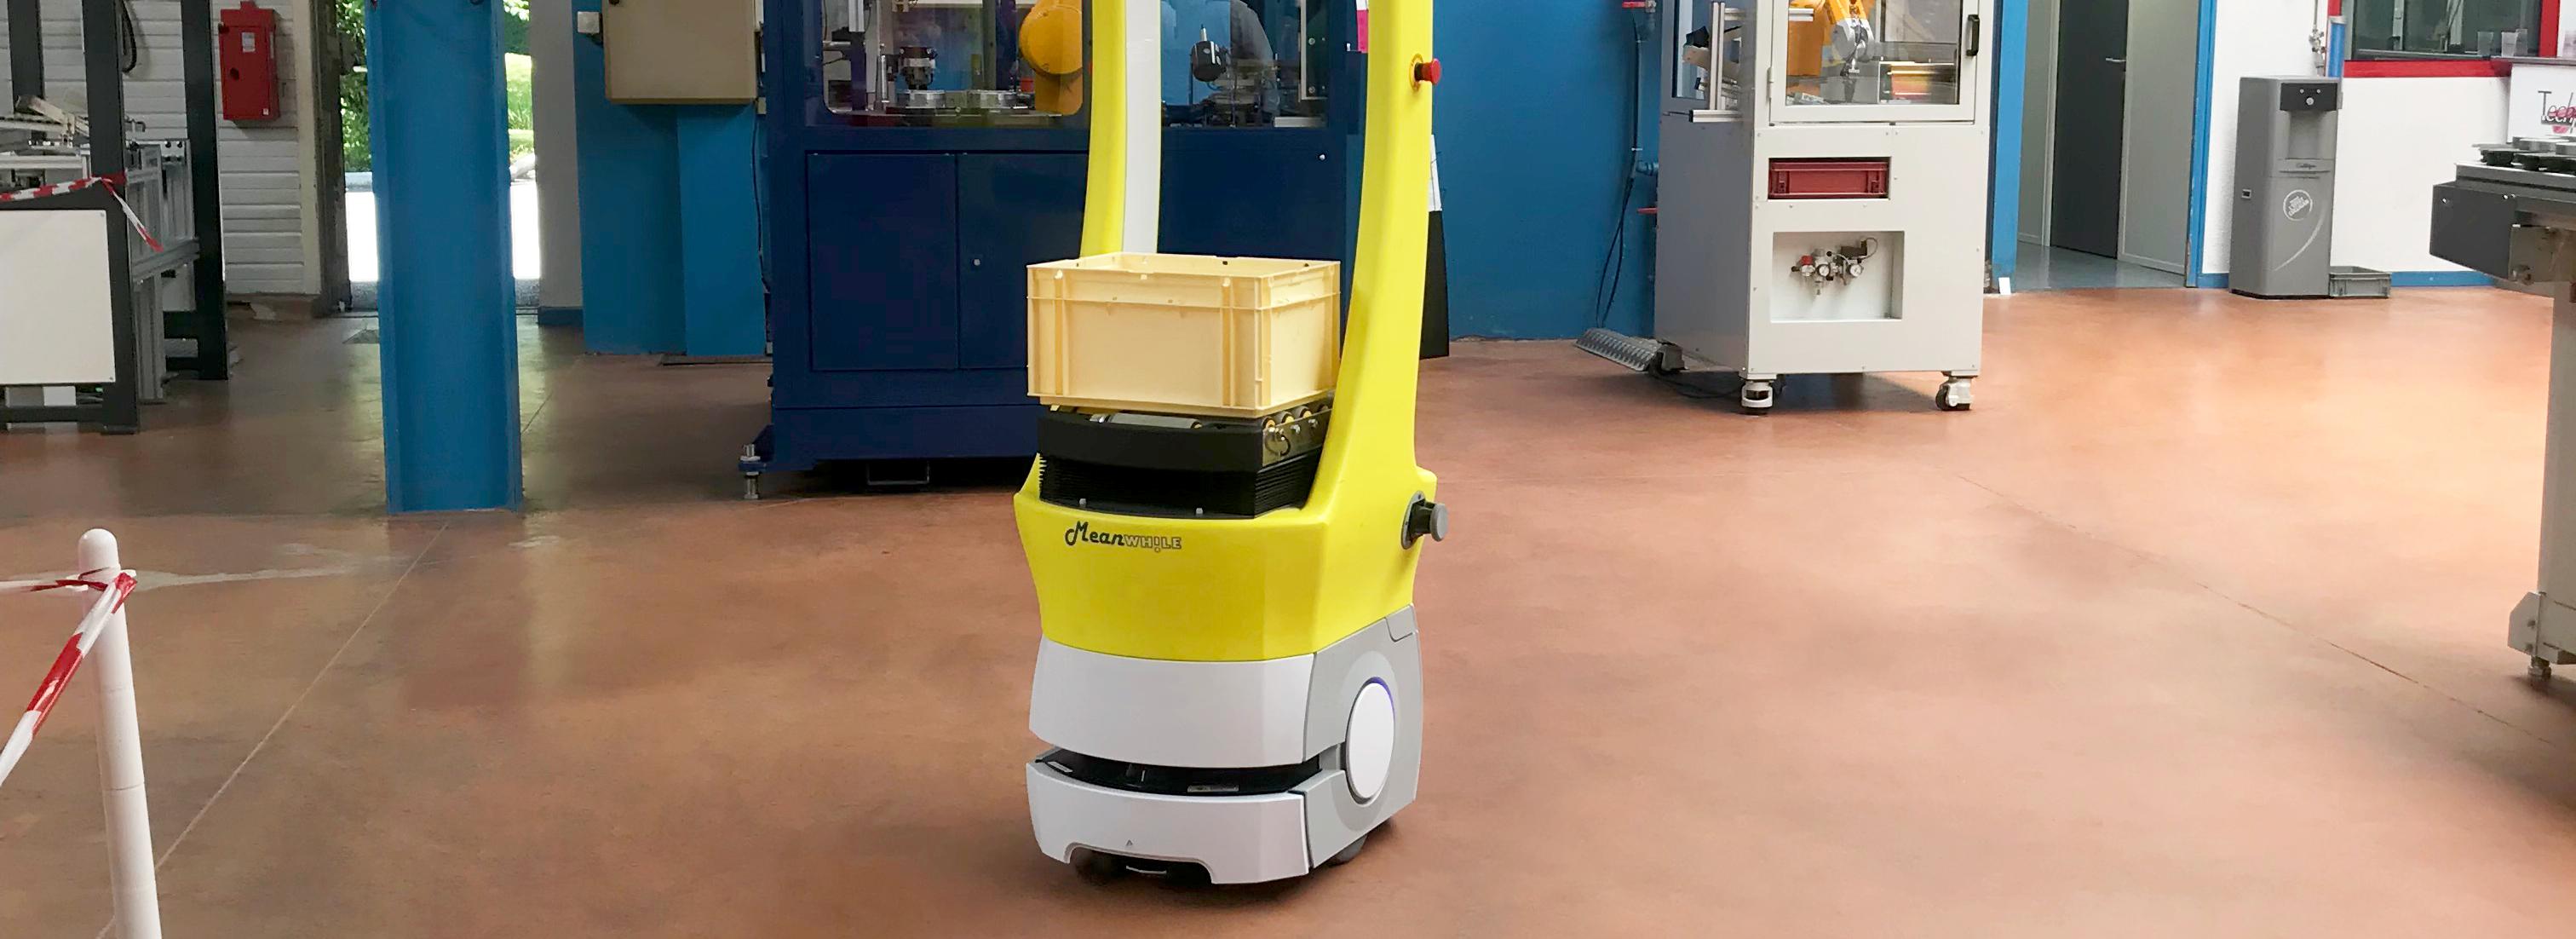 Agilog-robot-mobile-collaboratif